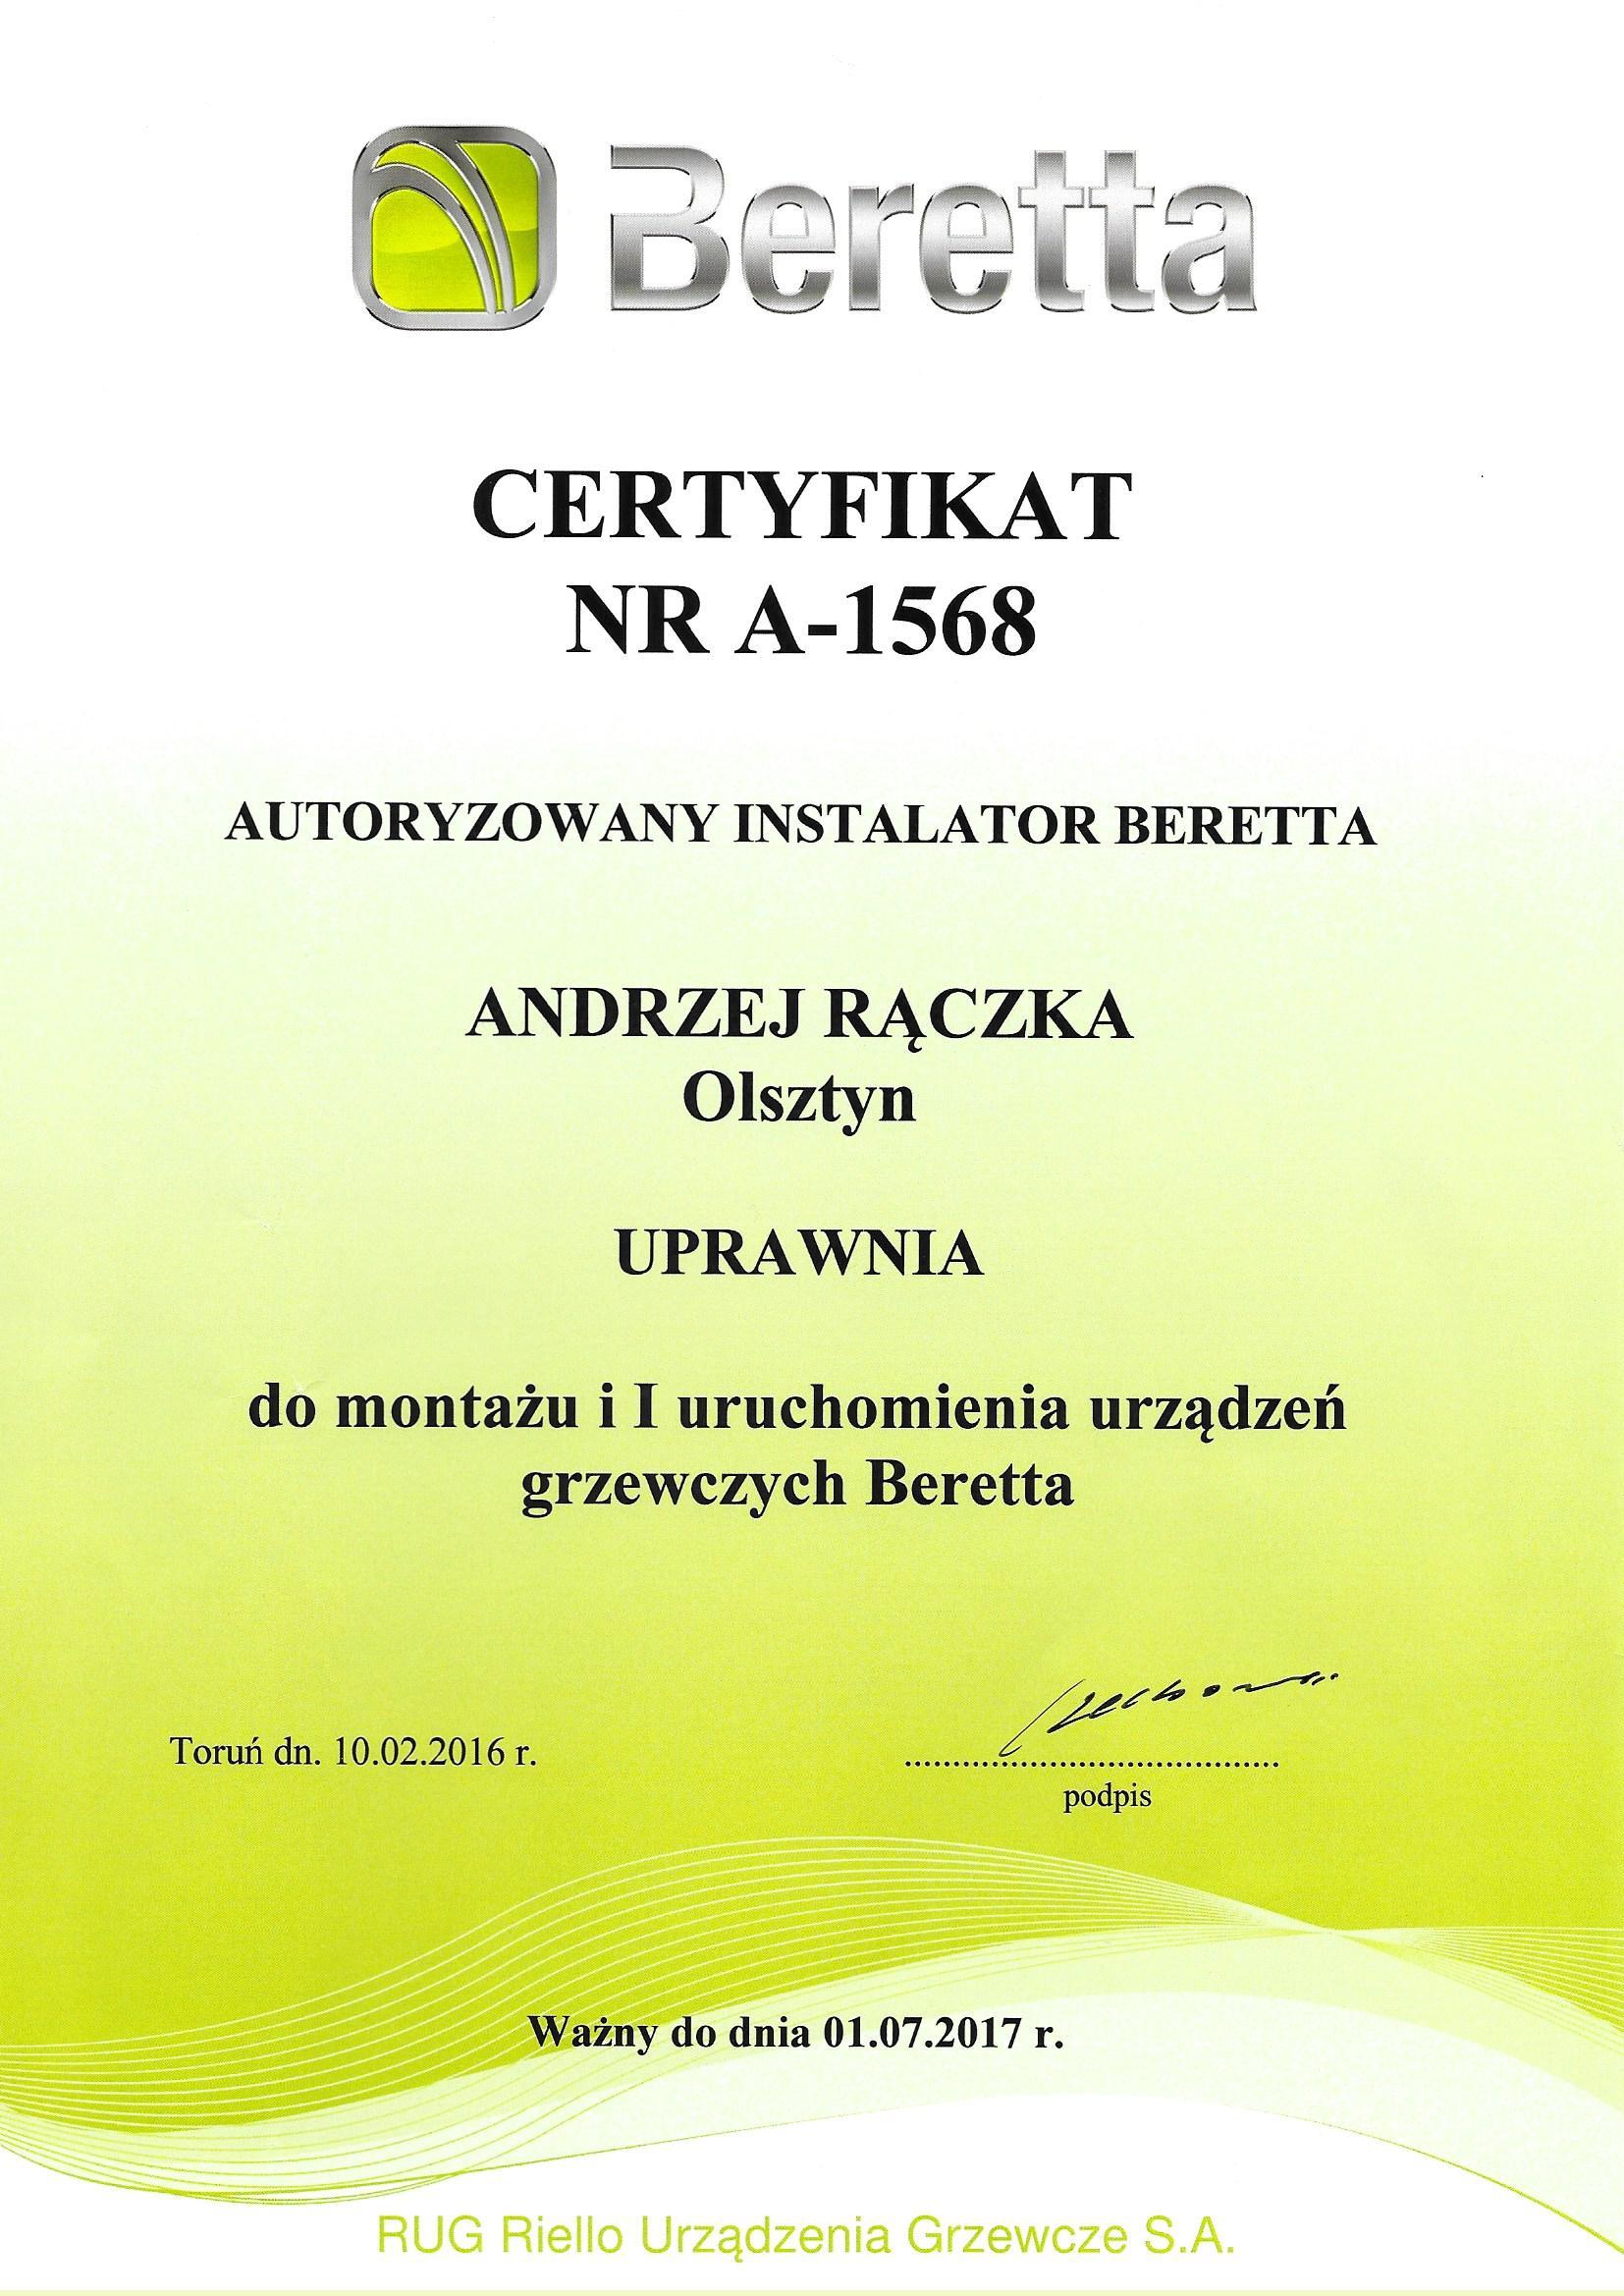 Beretta Certyfikat